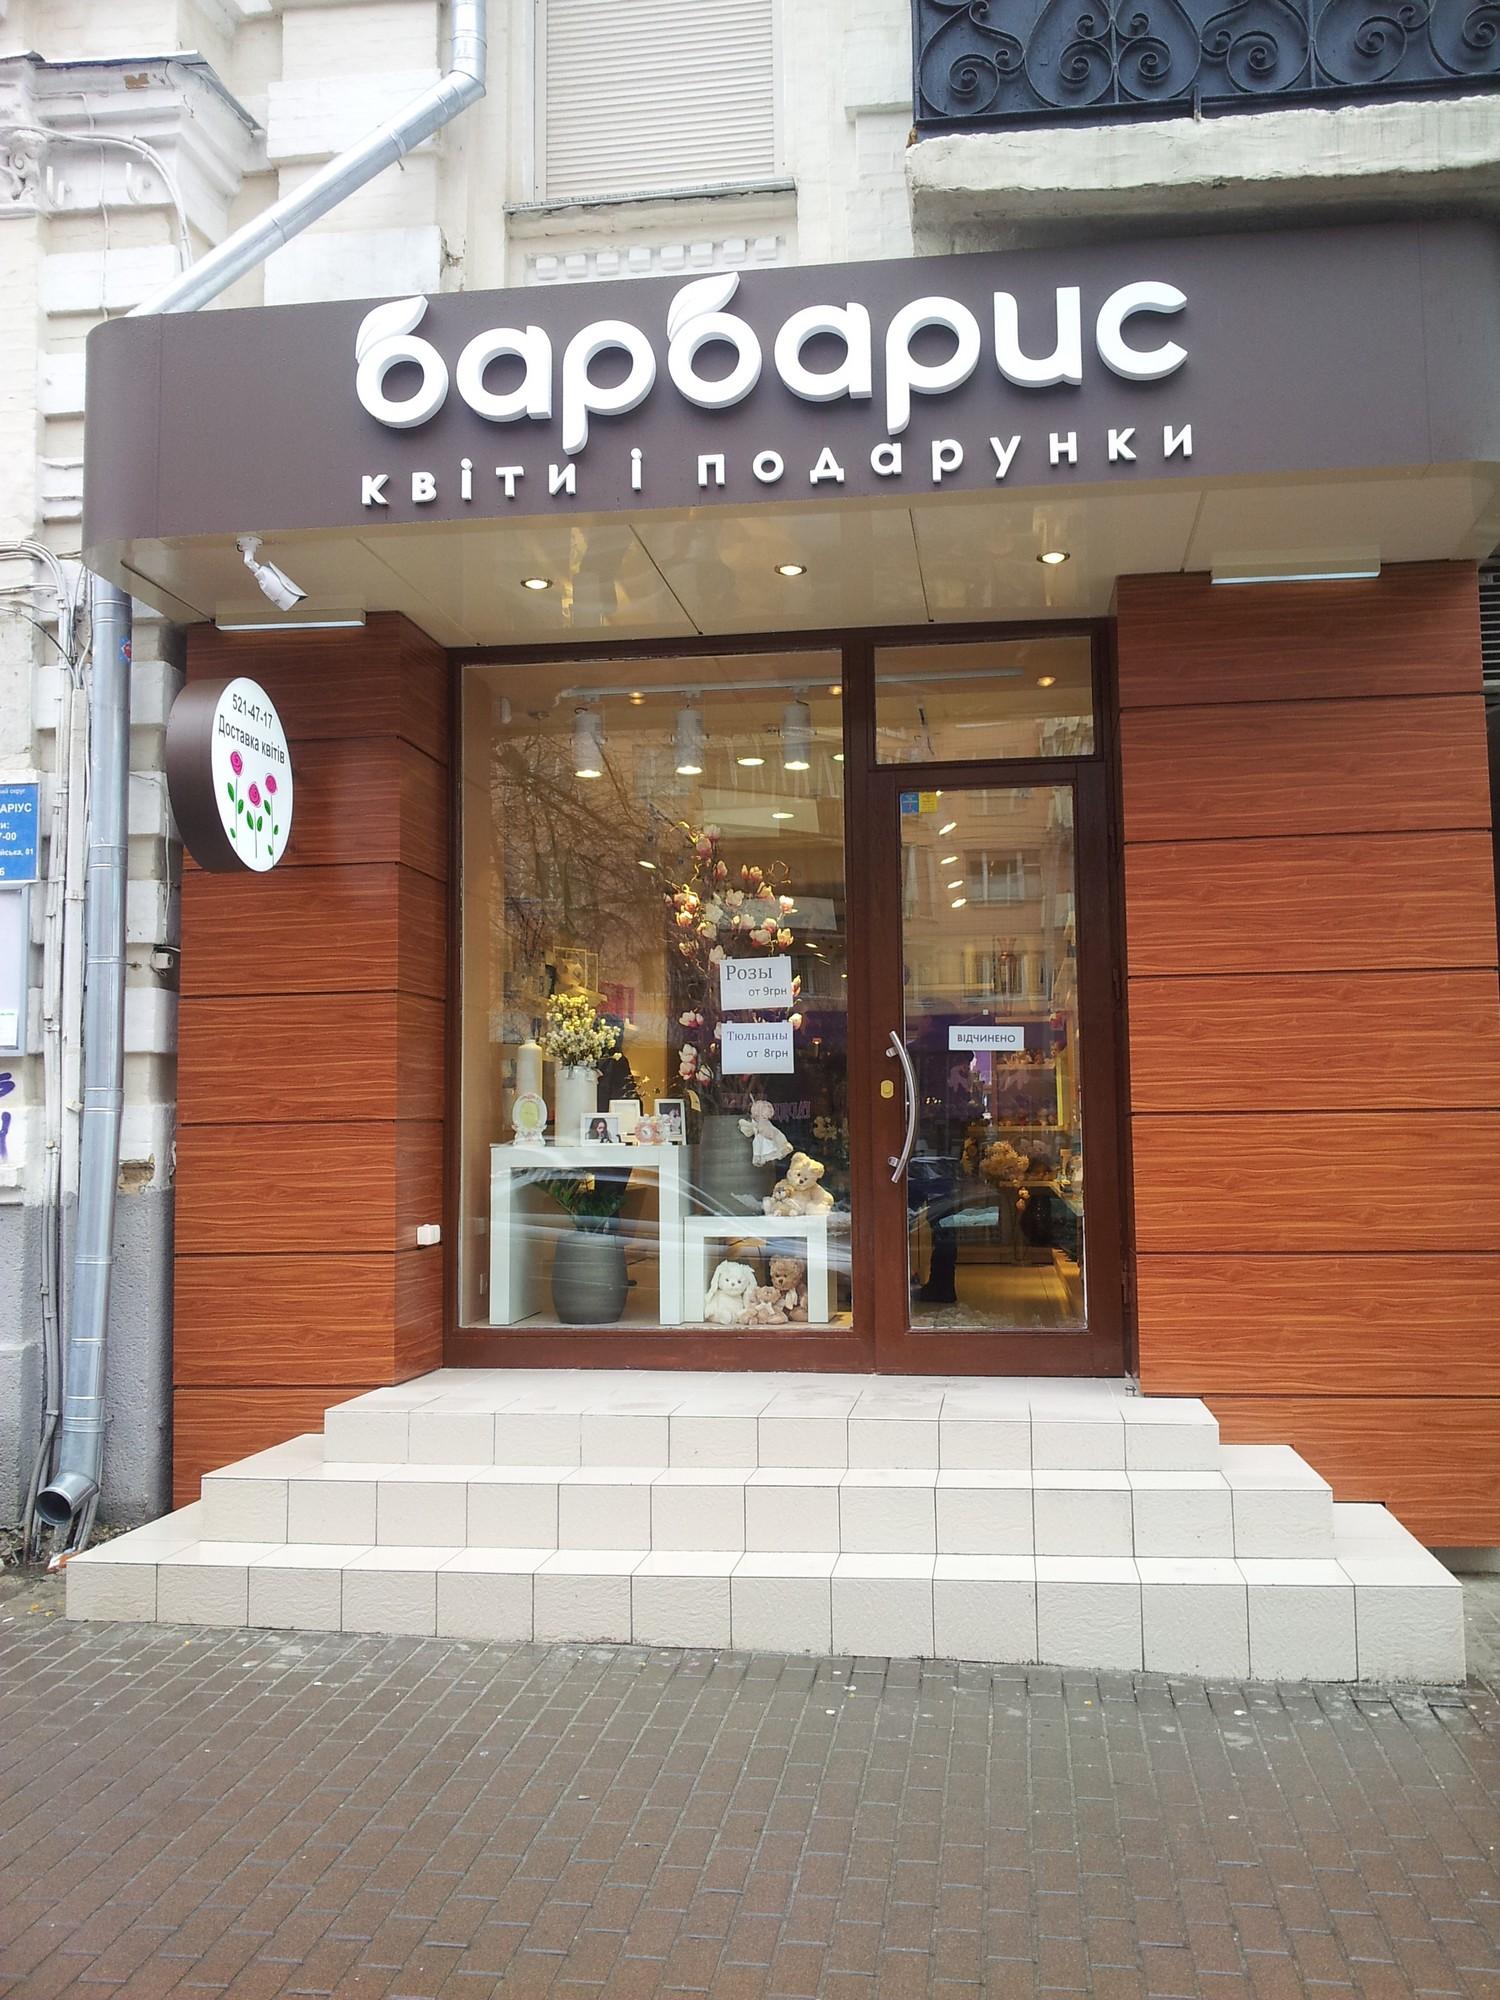 "Дизайн фасада магазина цветов ""Барбарис"""